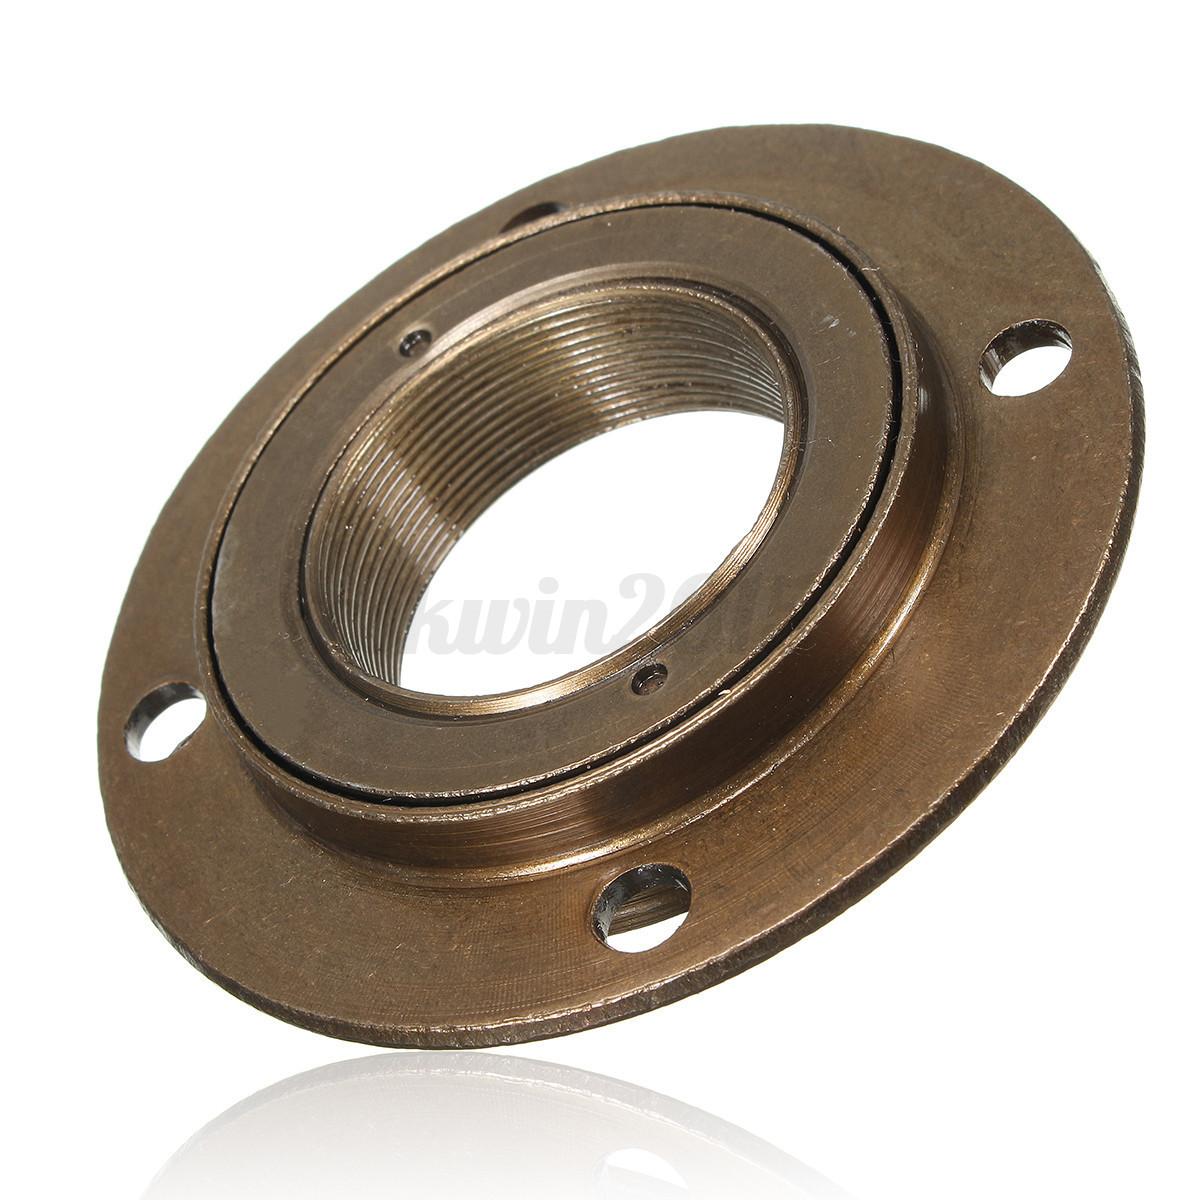 78mm clutch bearing freewheel for razor dirt rocket mx350 for Freewheel sprocket for electric motor